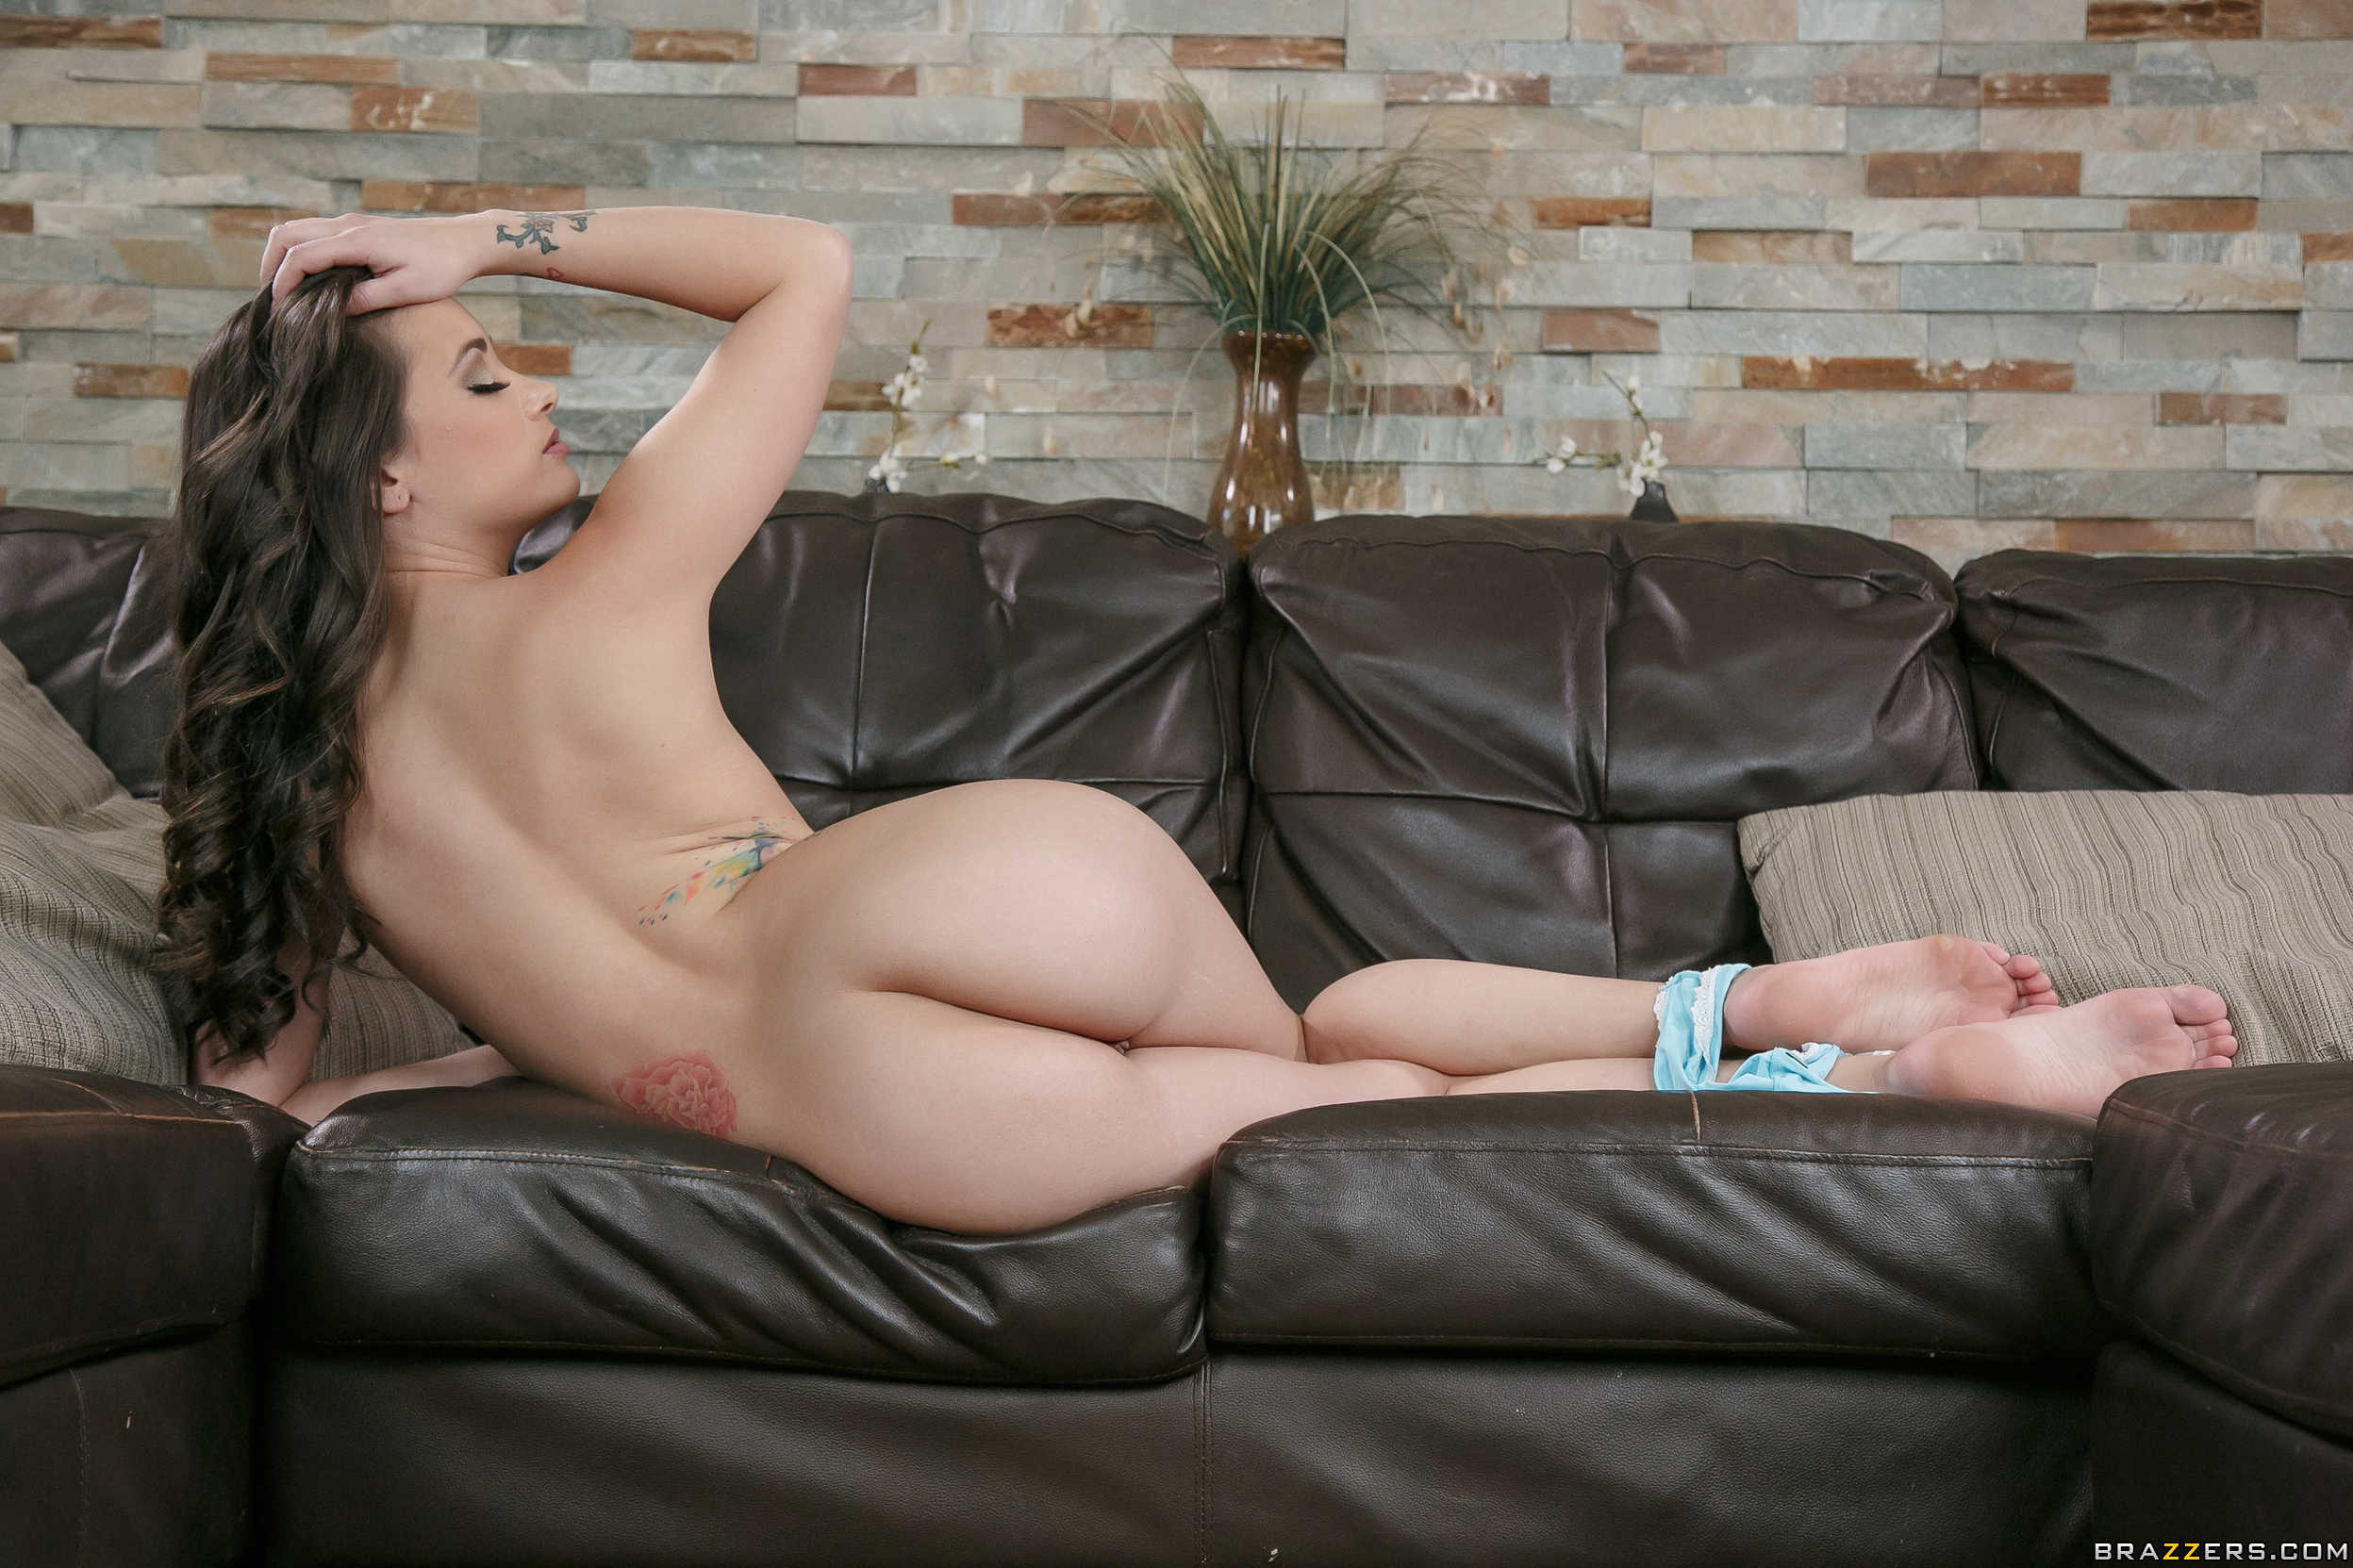 Gia Paige - el arte de enseñar la conchita